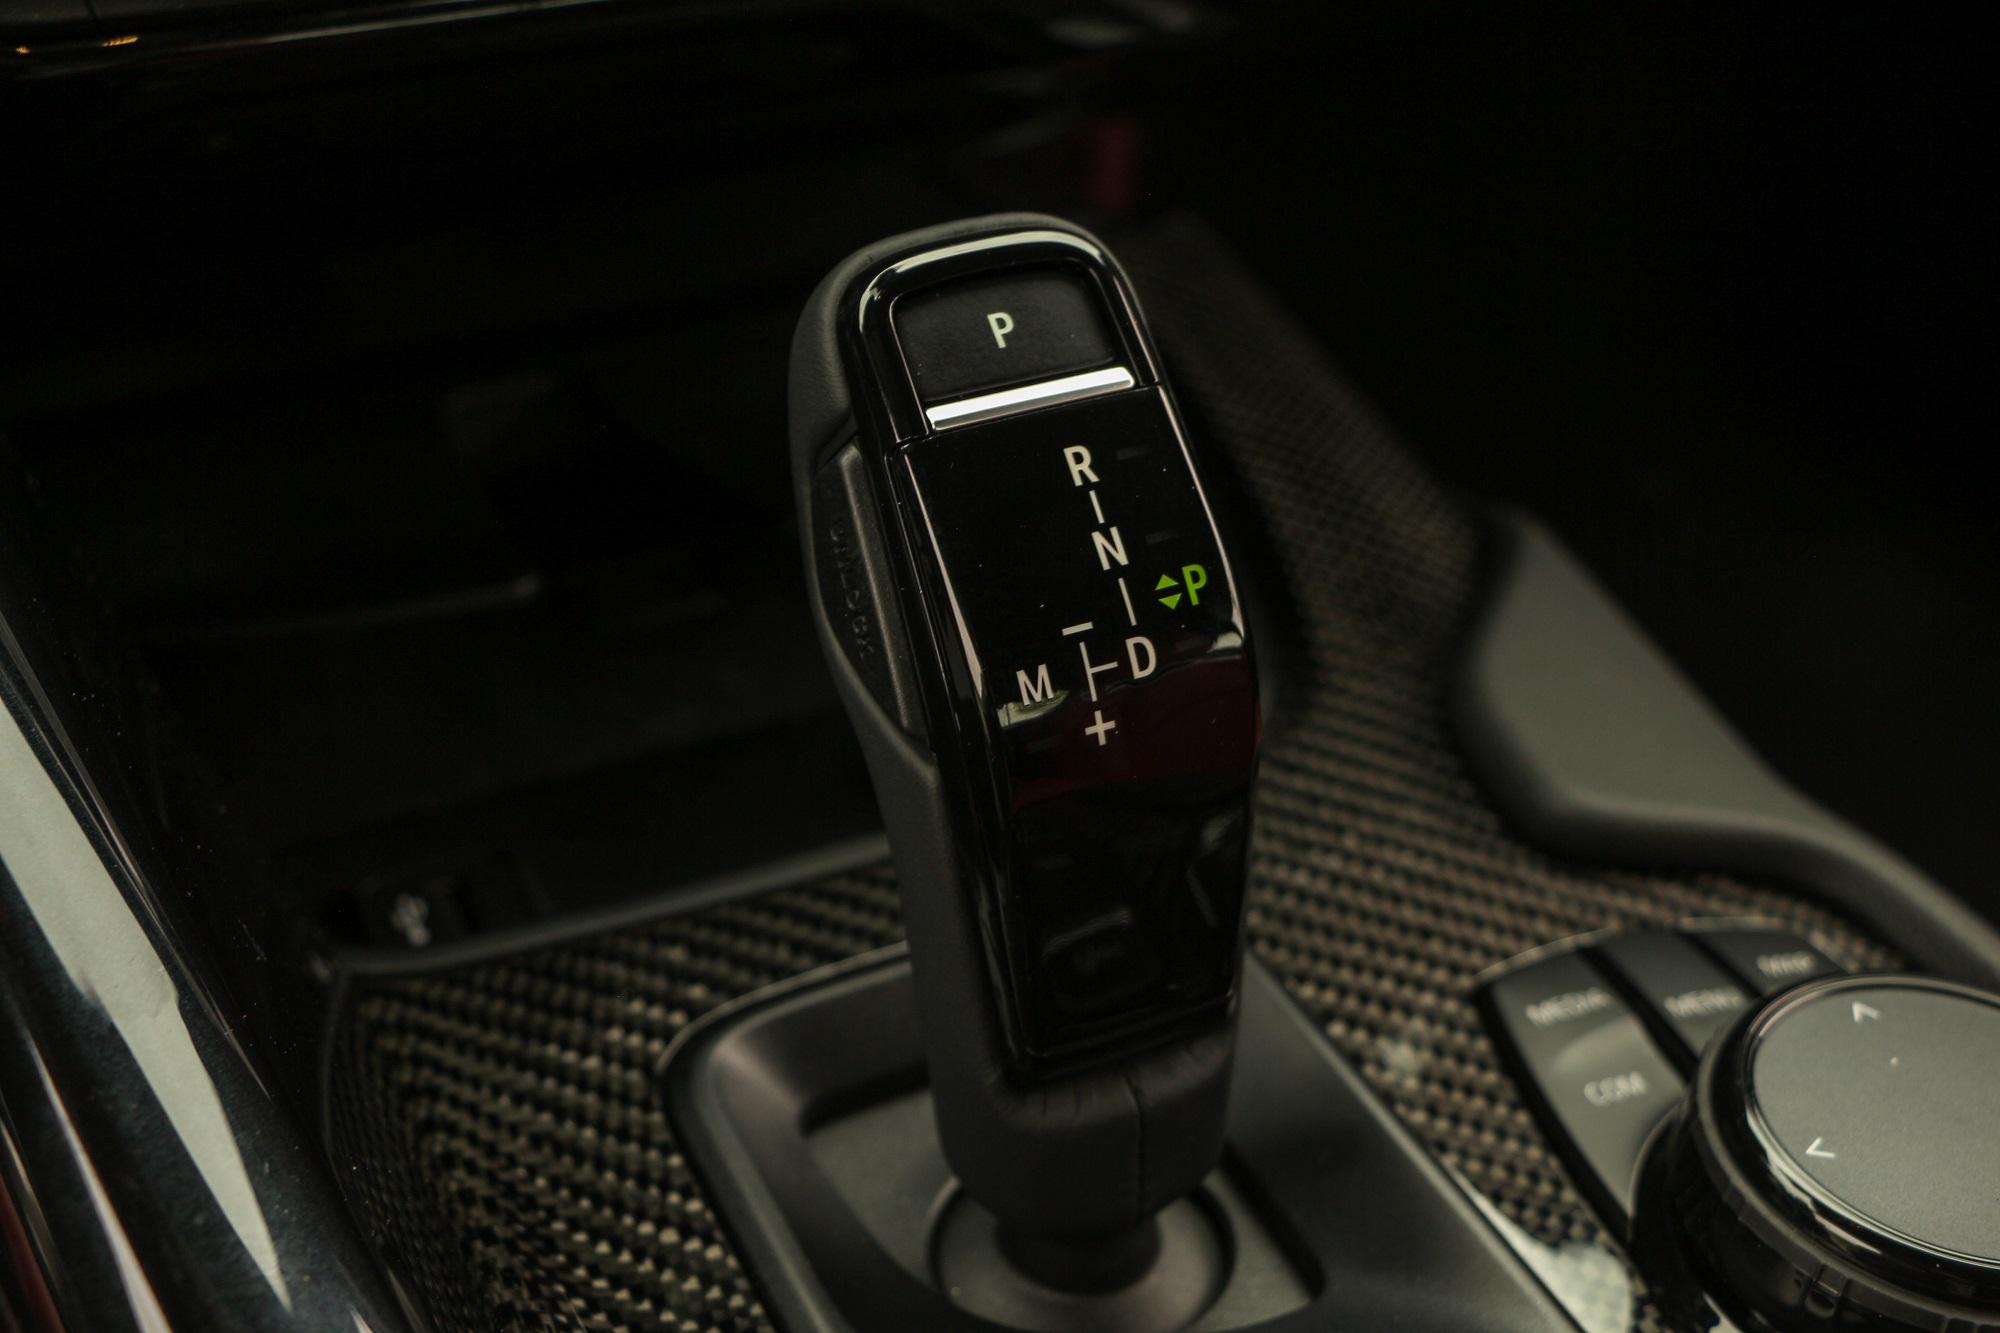 2020 Toyota Supra Drive Review Jake Stumph Interior Exterior Drive Options Price